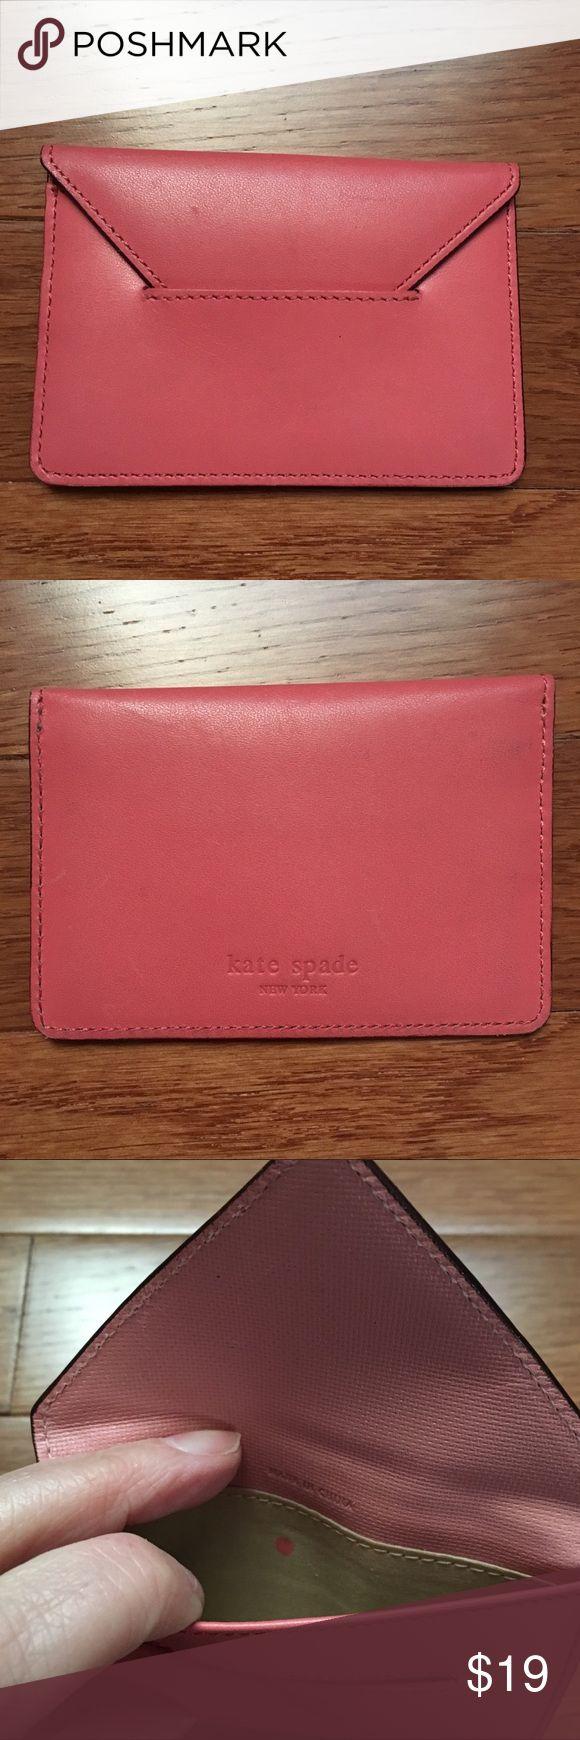 The 25+ best Key card holder ideas on Pinterest | Love pink sale ...